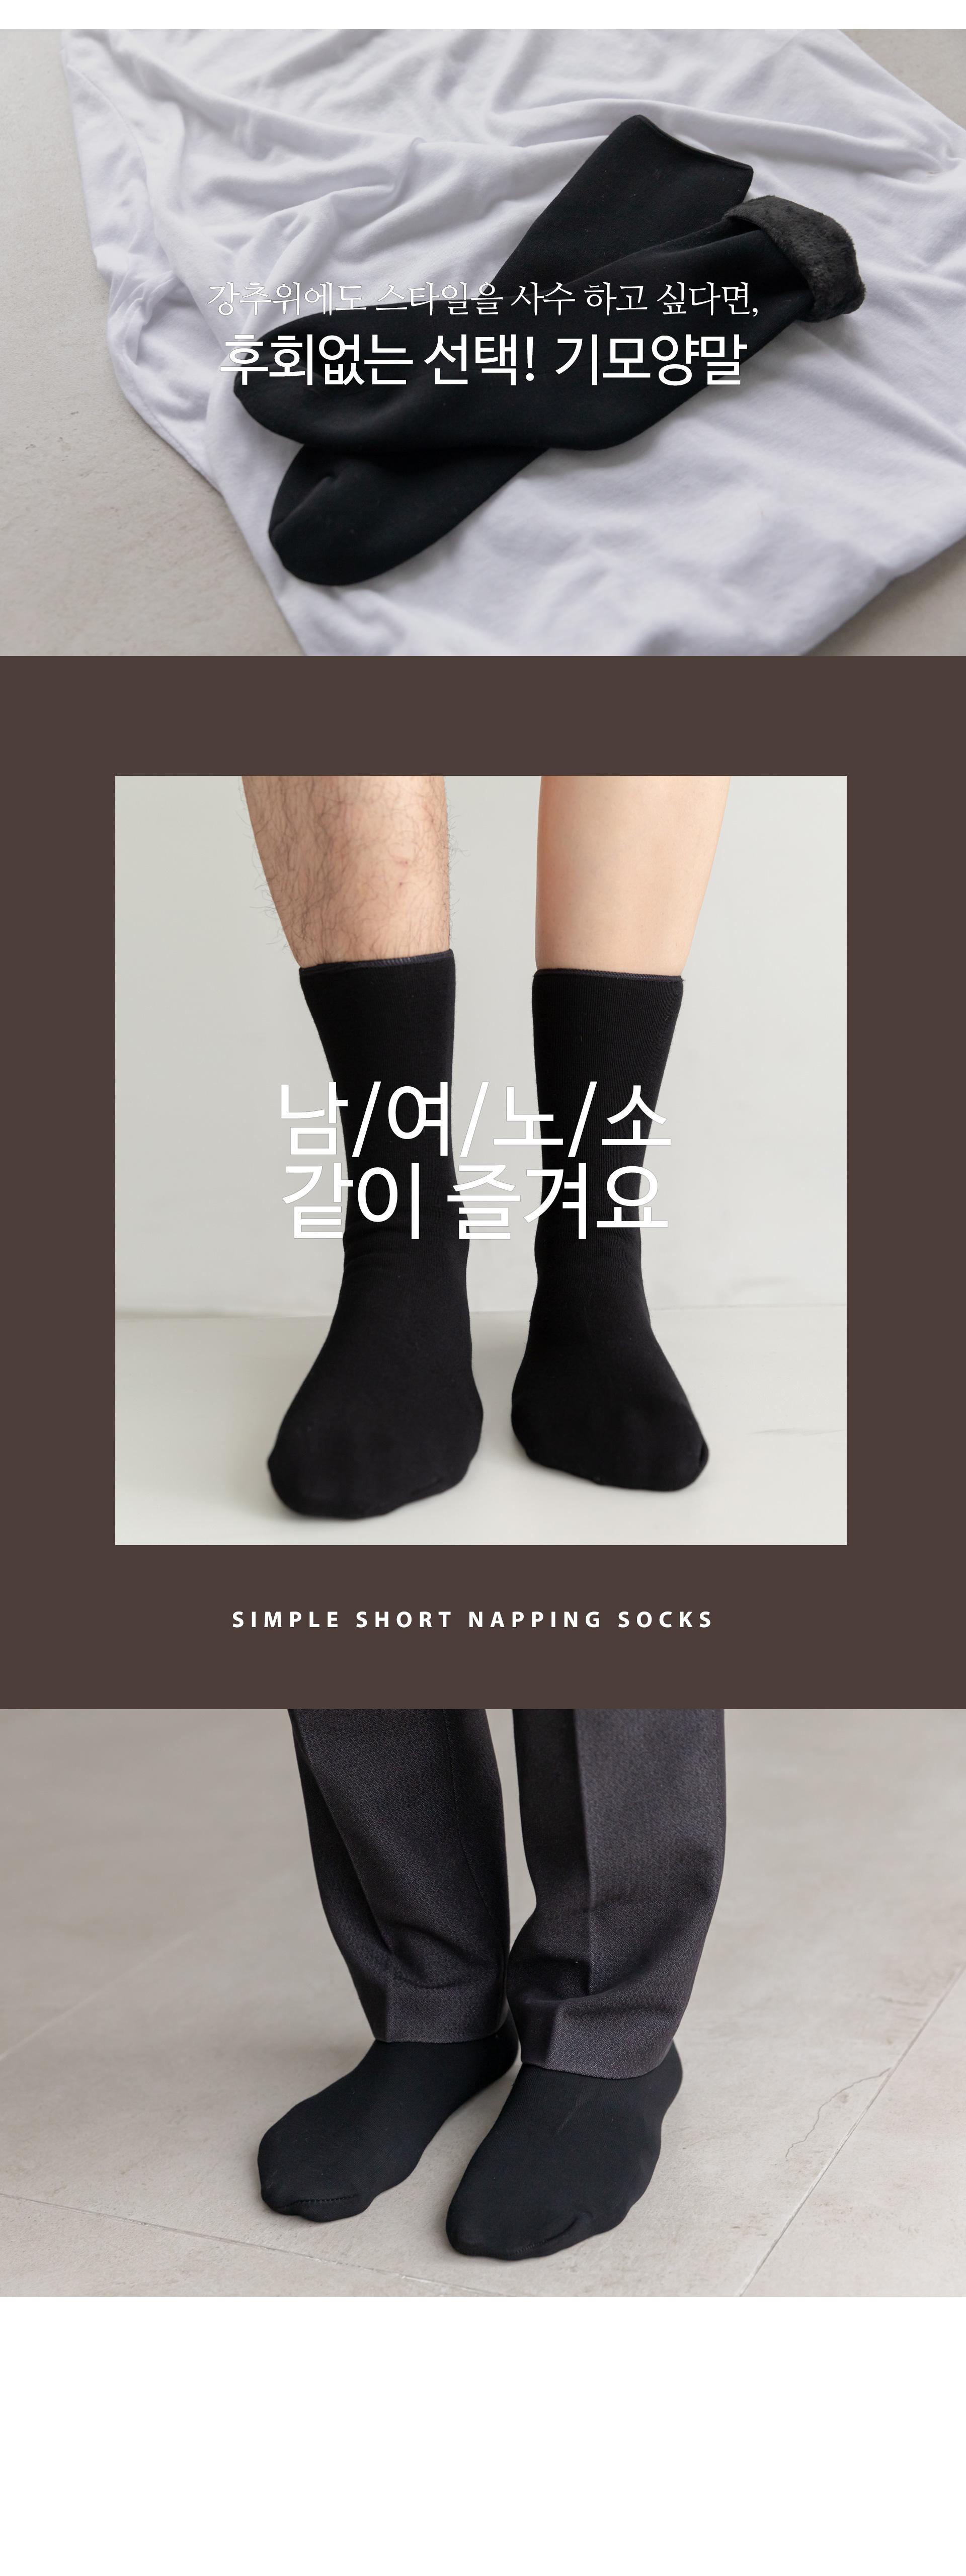 Unisex public / private capital Fleece-lined short socks # 85933